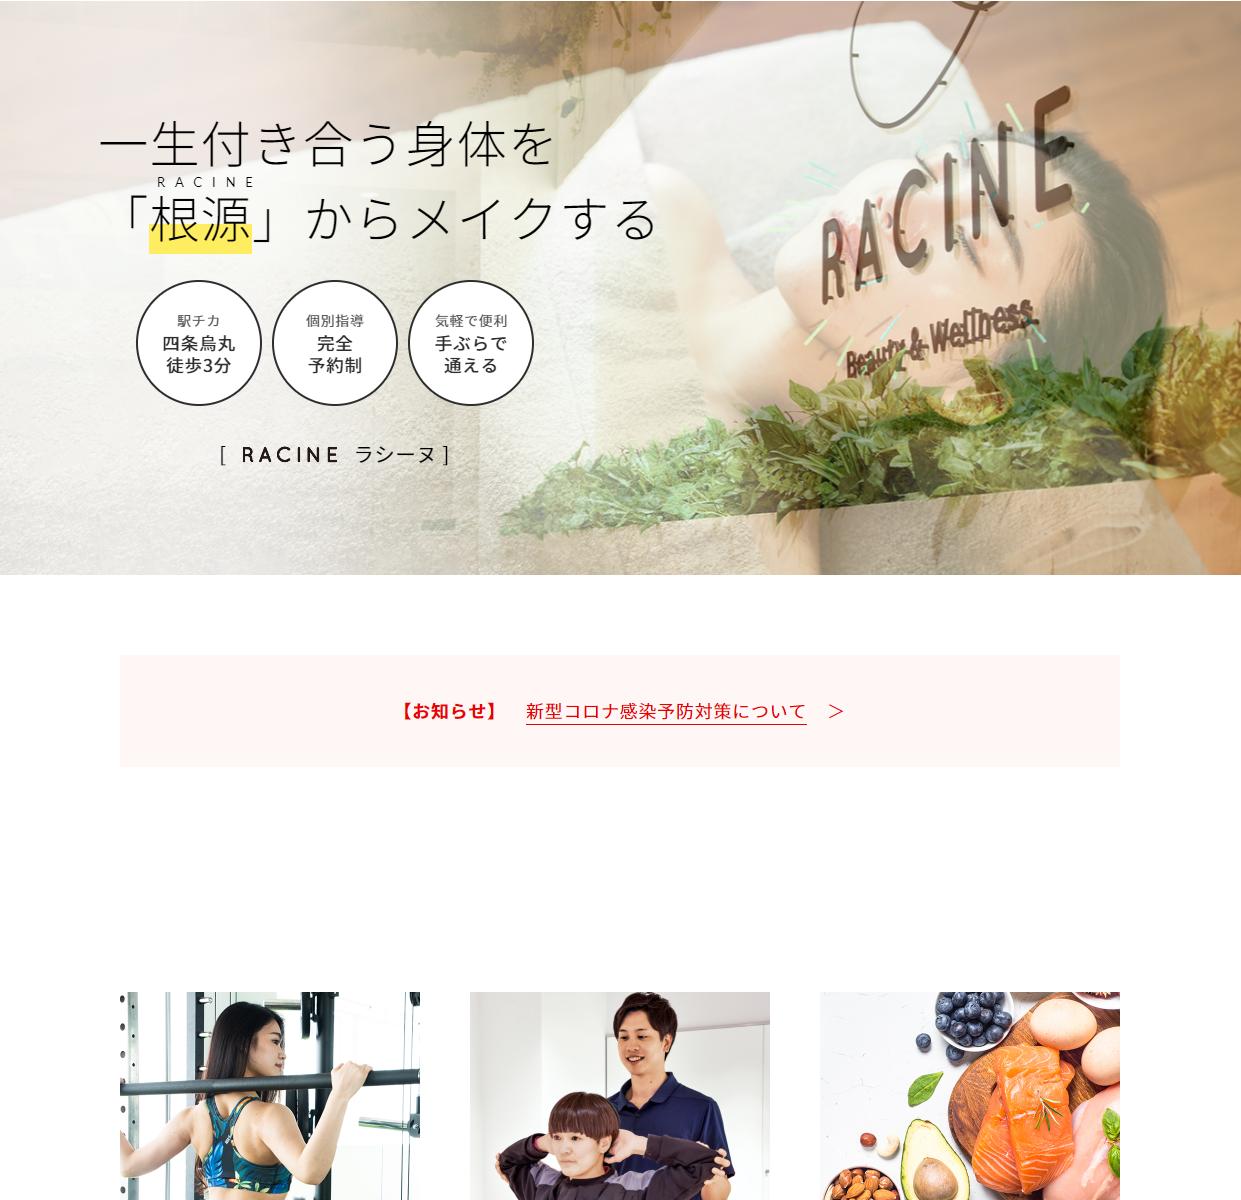 "<span class=""title"">RACINE(ラシーヌ)の口コミや評判</span>"